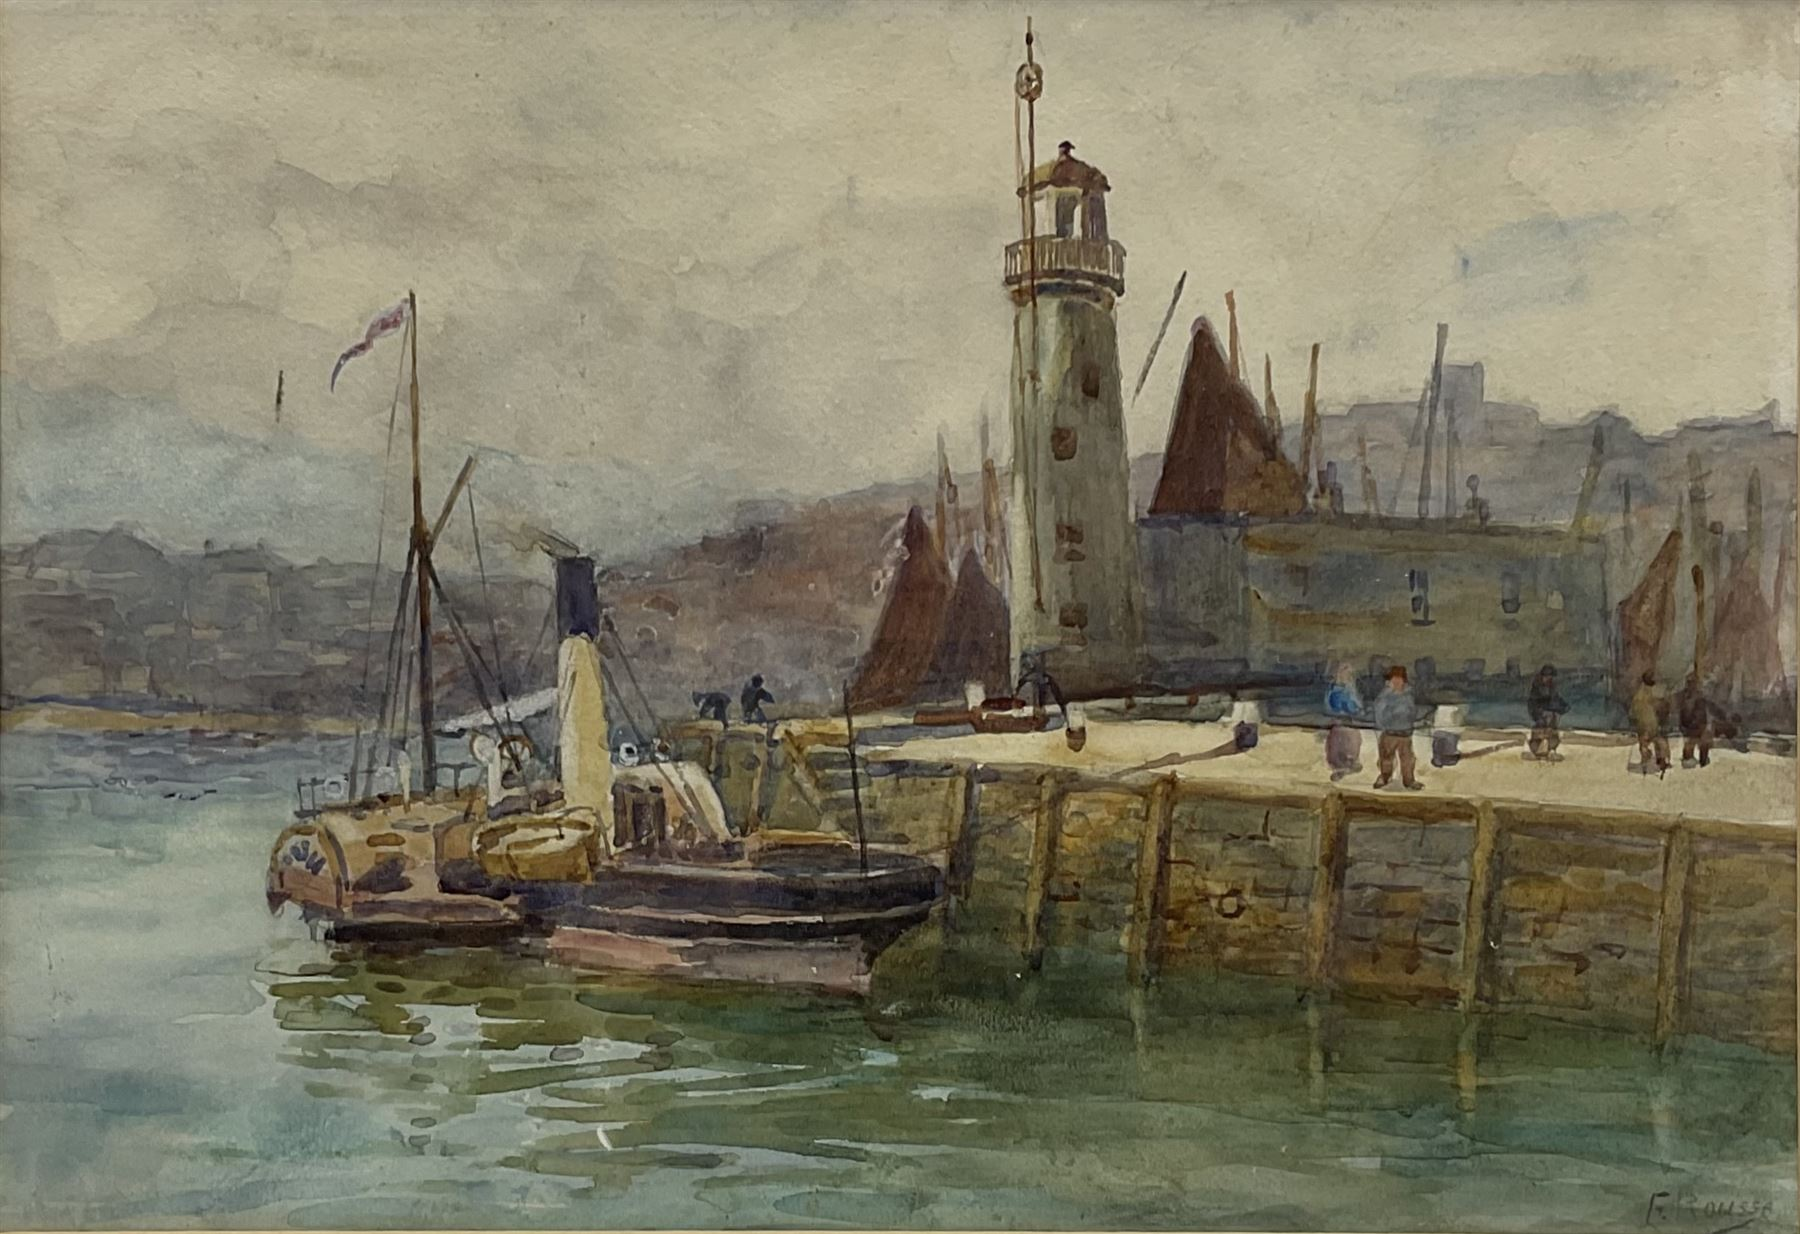 Frank Rousse (British fl.1897-1917): Paddle Steamer moored along side Scarborough Lighthouse